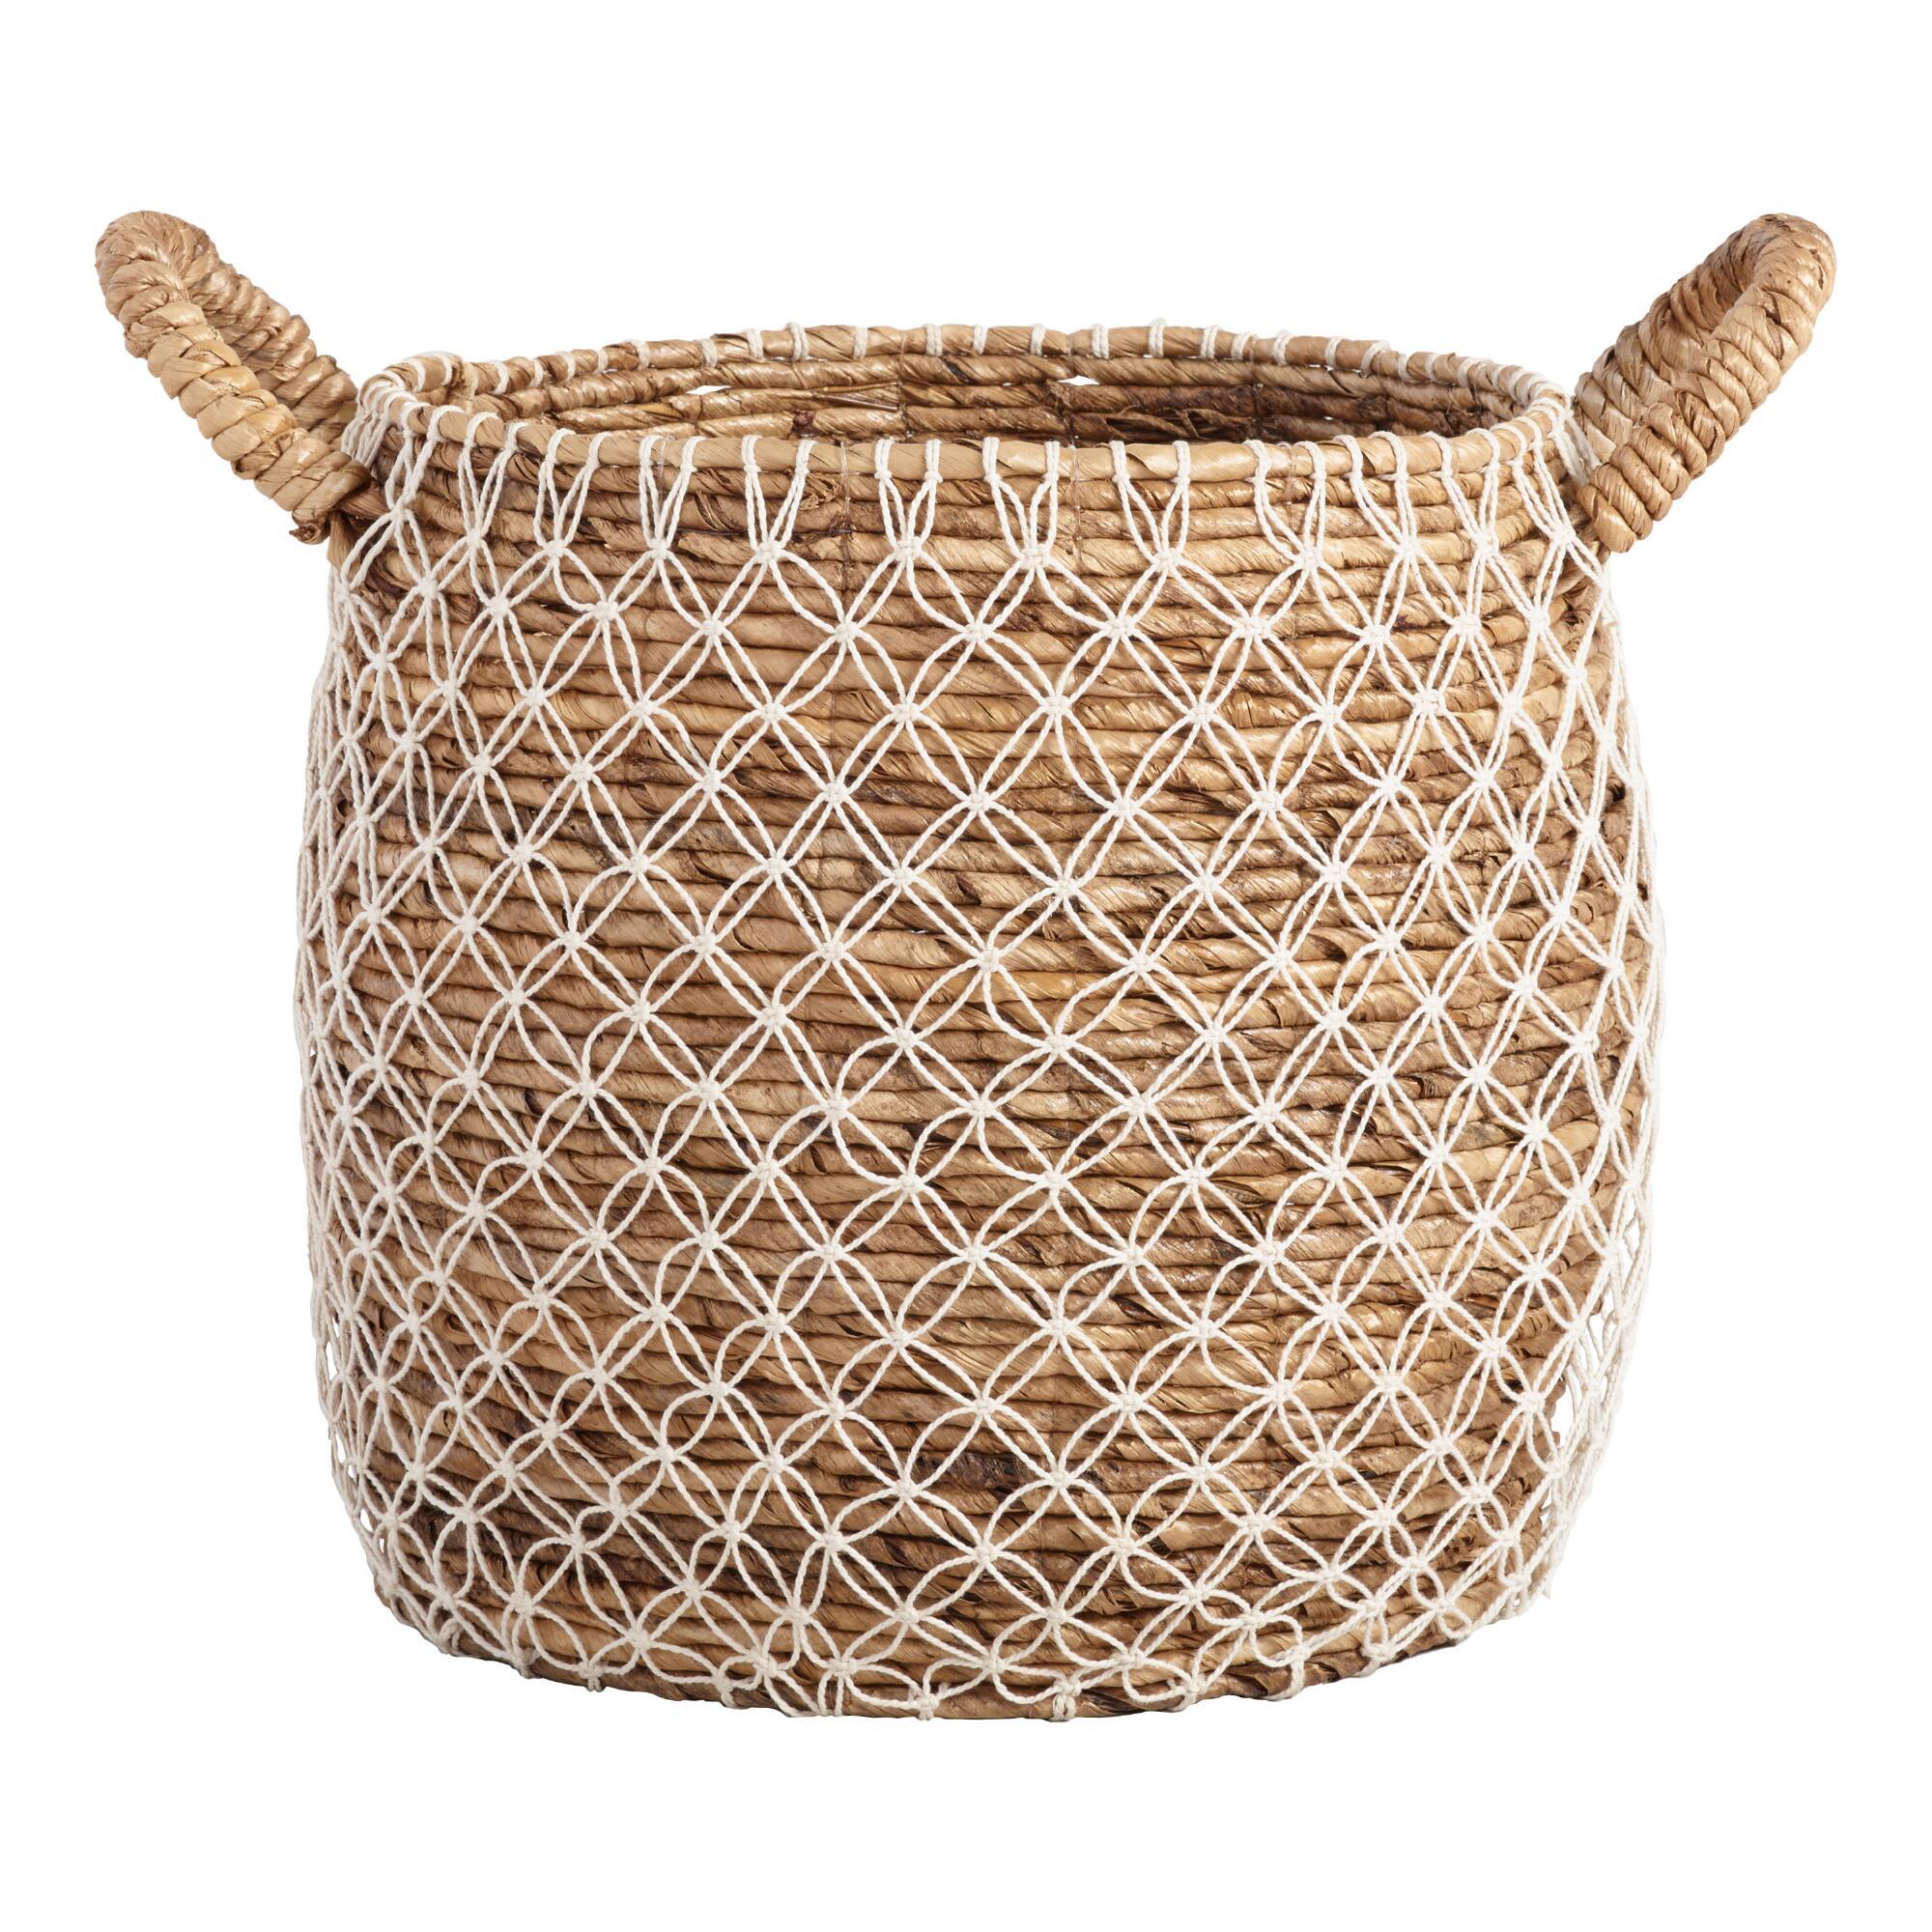 Woven Macrame Basket Best Bridal Shower Gifts